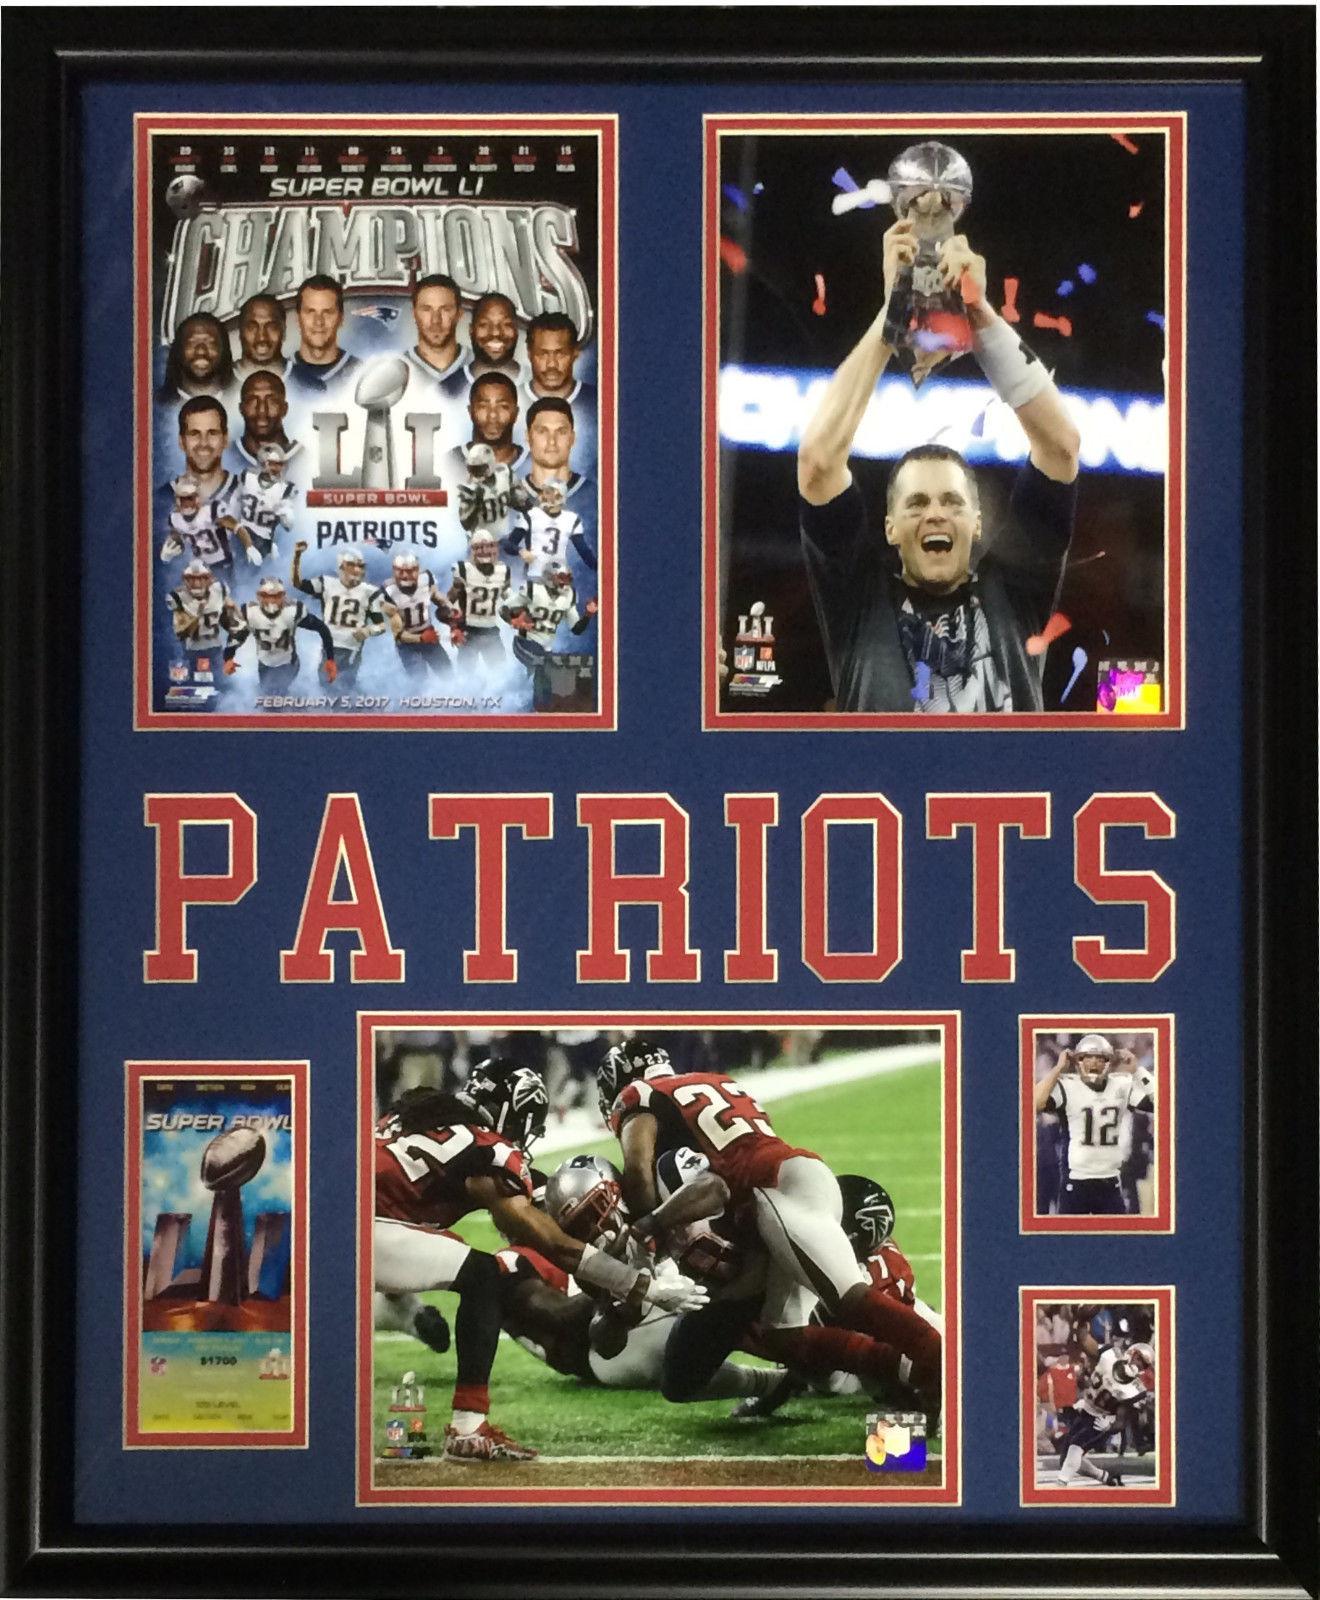 Patriots Super Bowl 51 Champions 5 photo ticket framed Tom Brady MVP 22×27